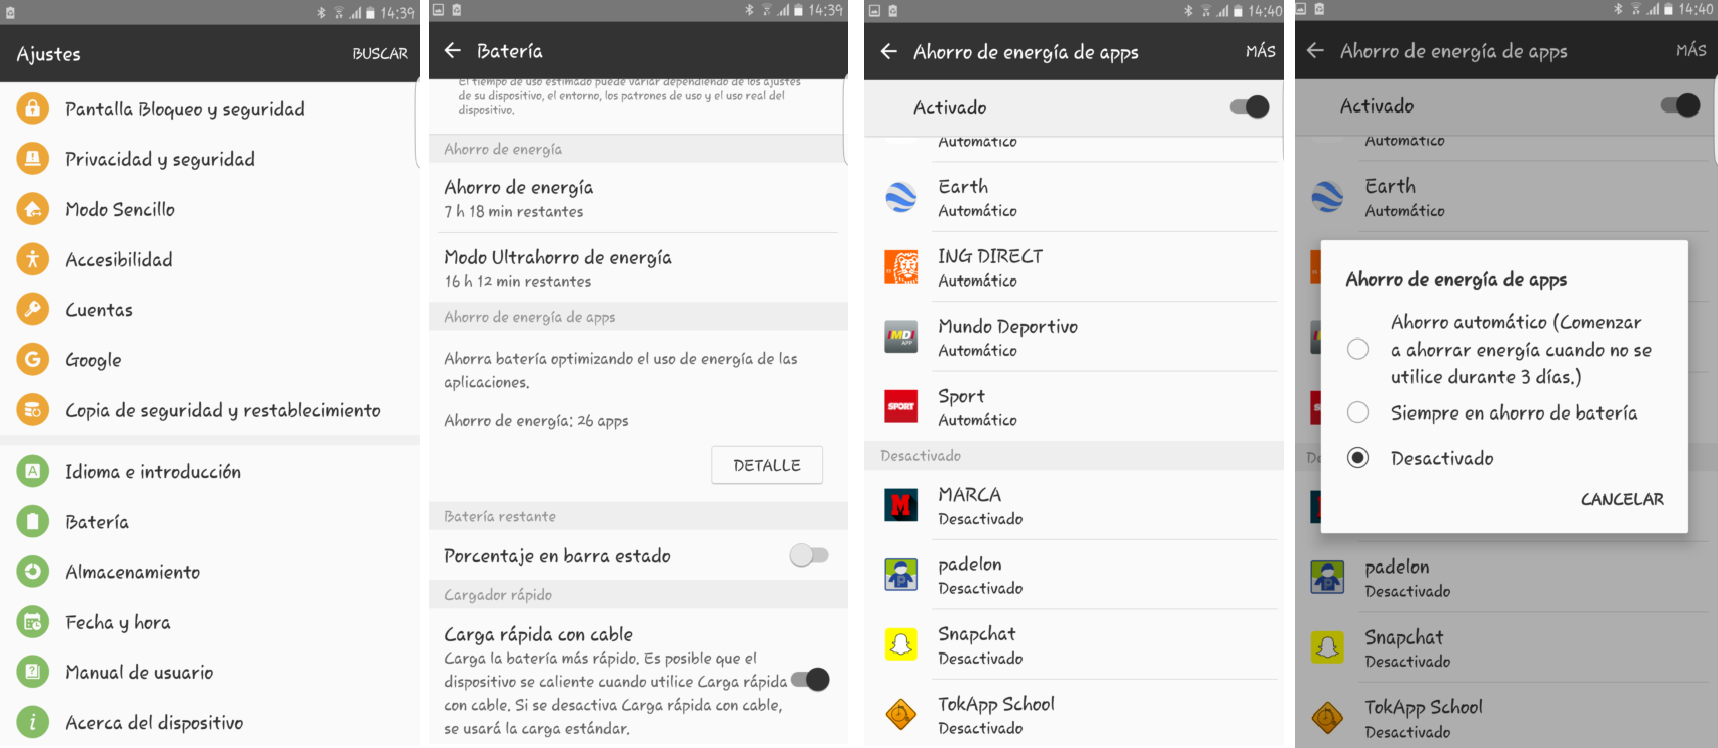 Desactivar modo ahorro de batería en teléfonos Samsung - Soporte TokApp